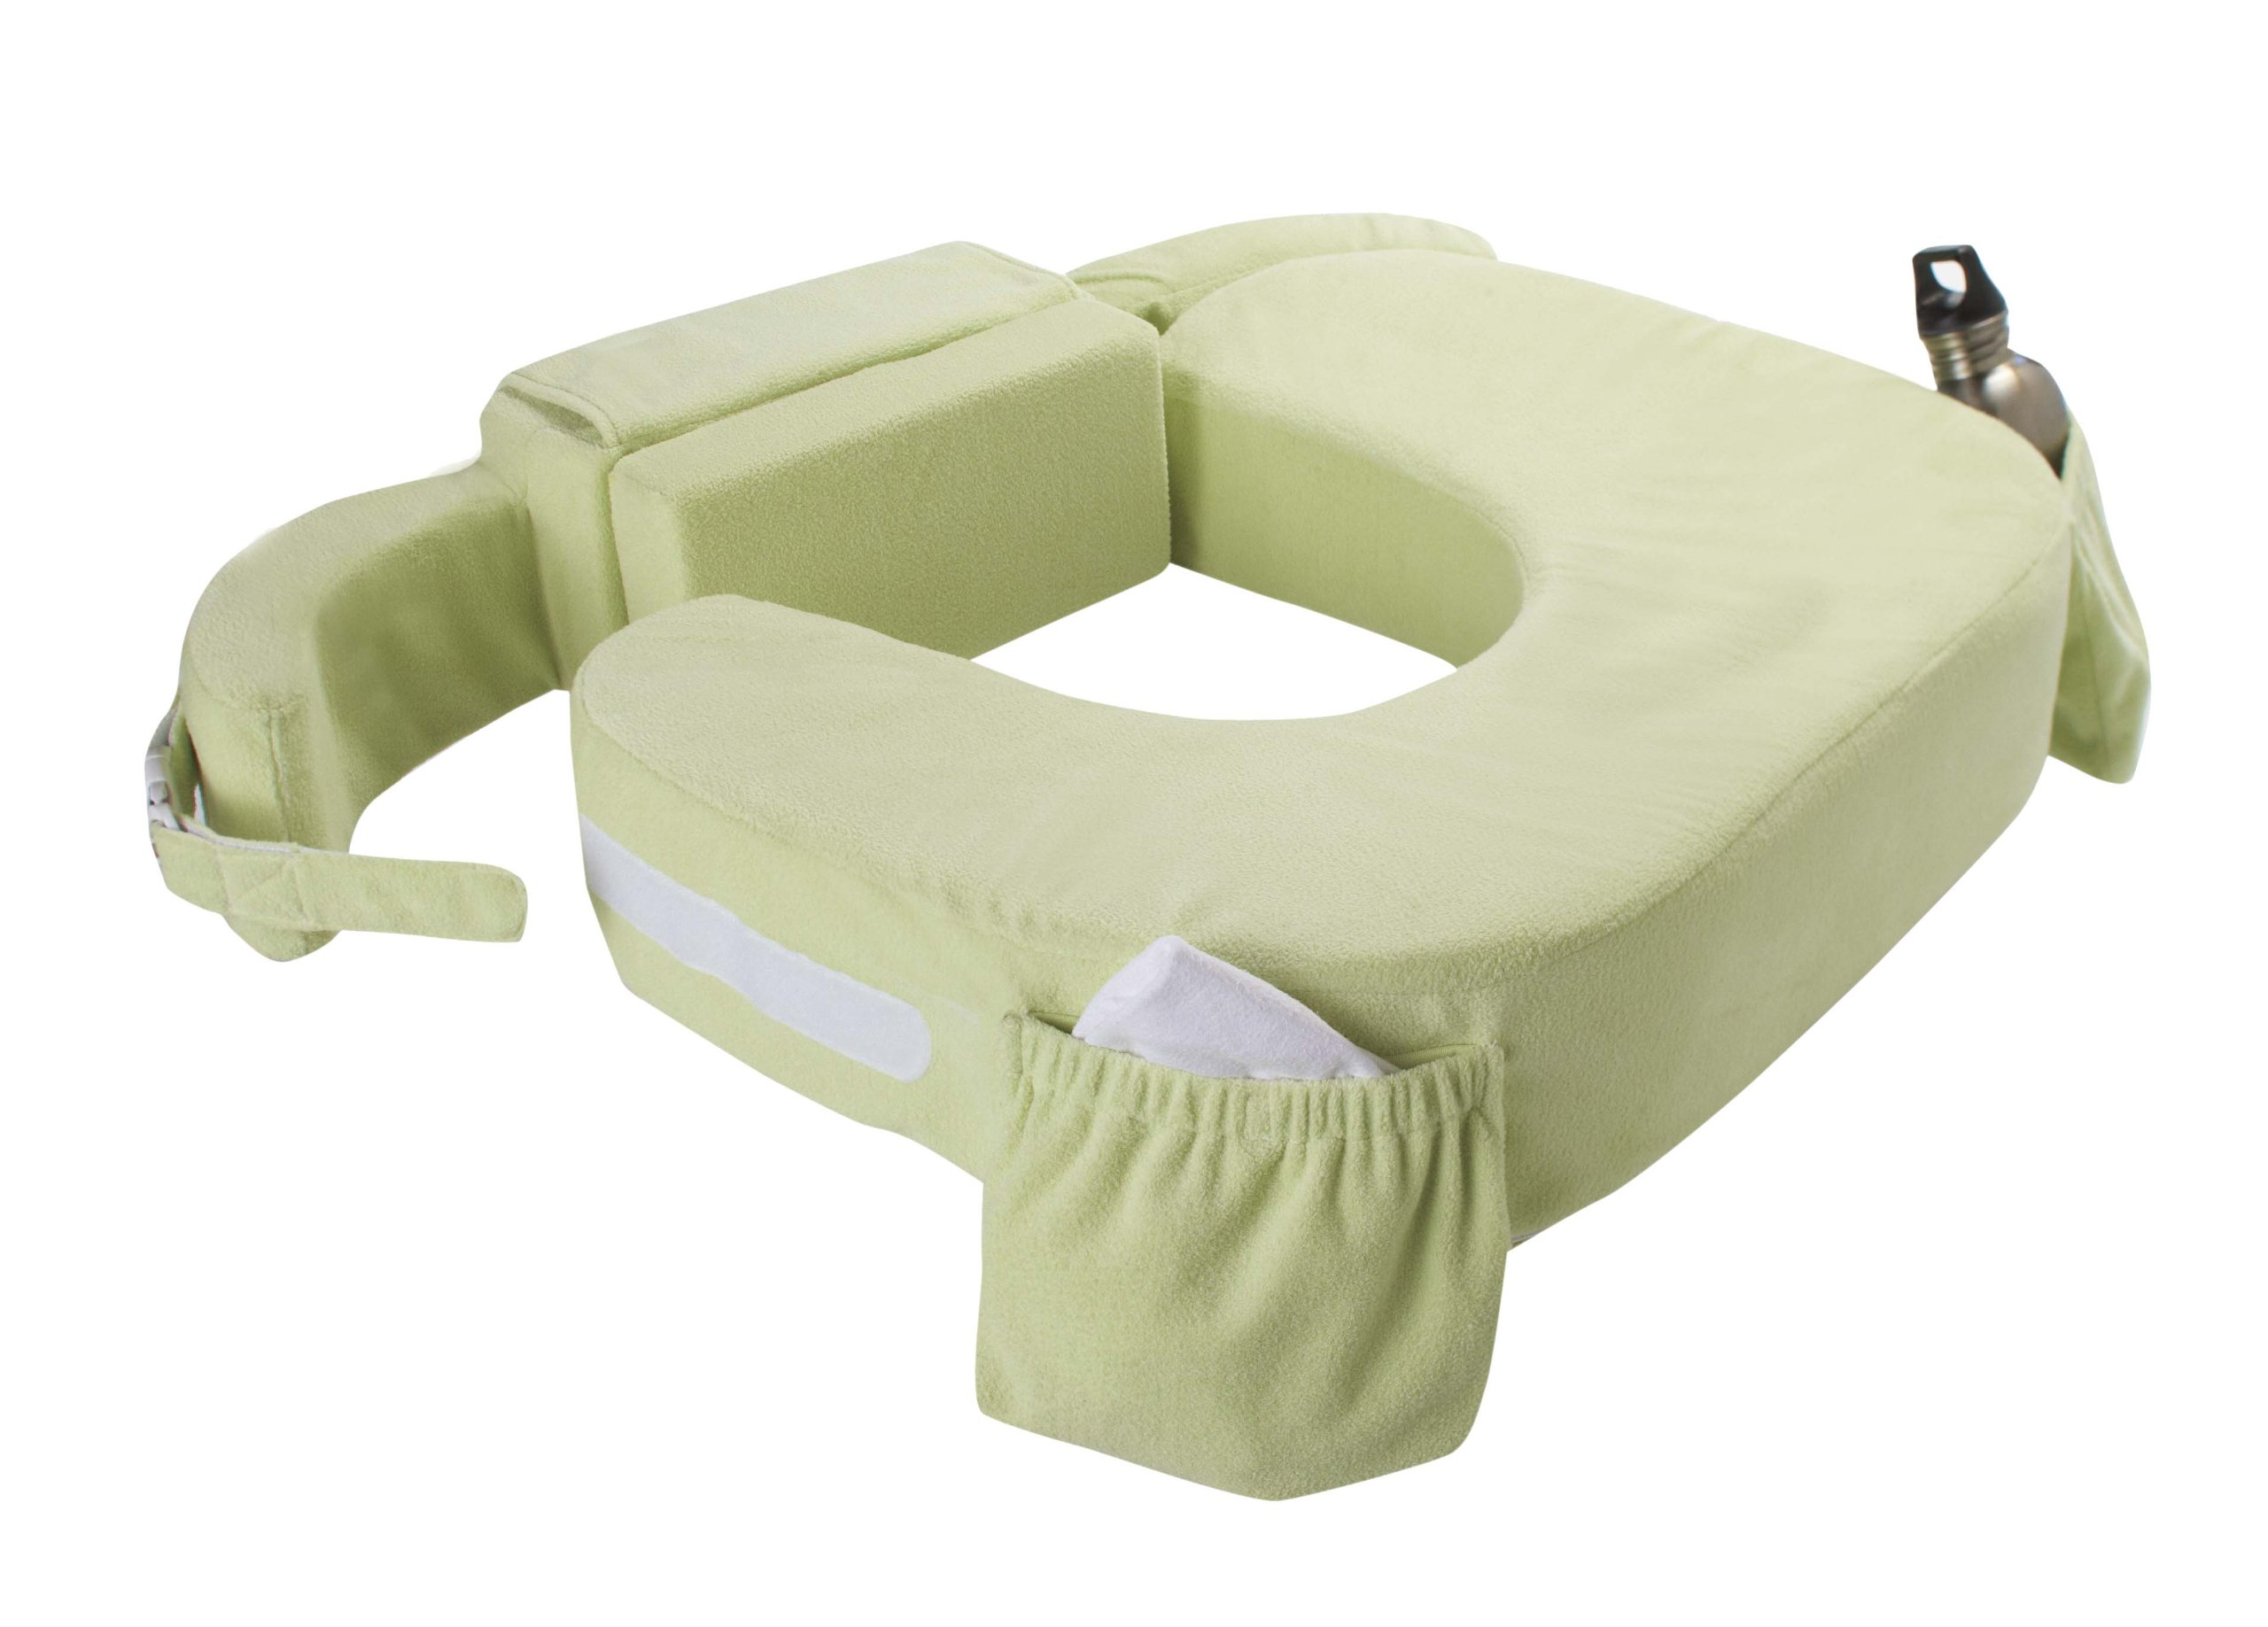 My Brest Friend Twin Nursing Pillow Deluxe Slipcover - Machine Washable Breastfeeding Cushion Cover - Pillow not Included, Green by My Brest Friend